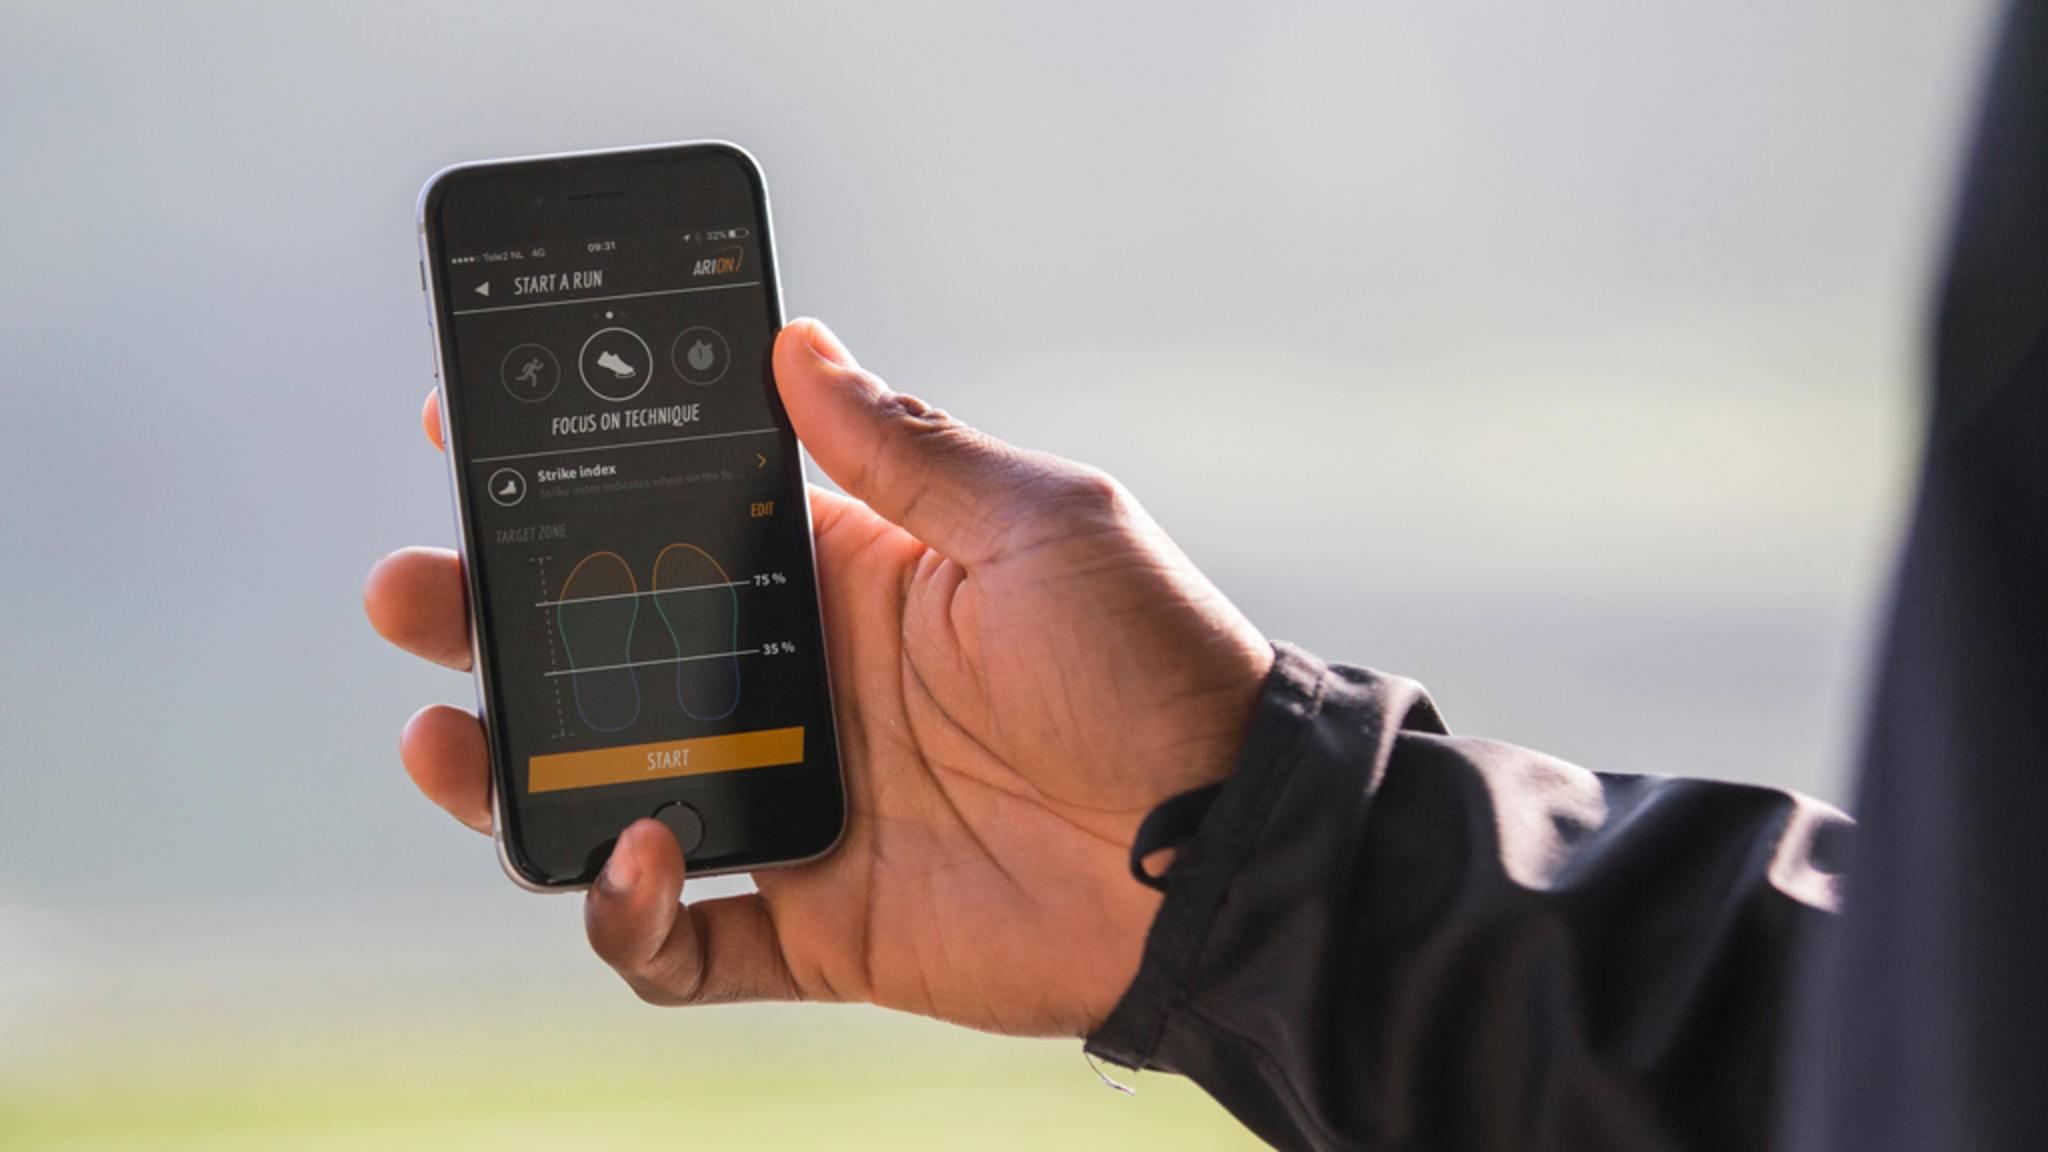 Die App liefert bei Bedarf Echtzeit-Feedback.